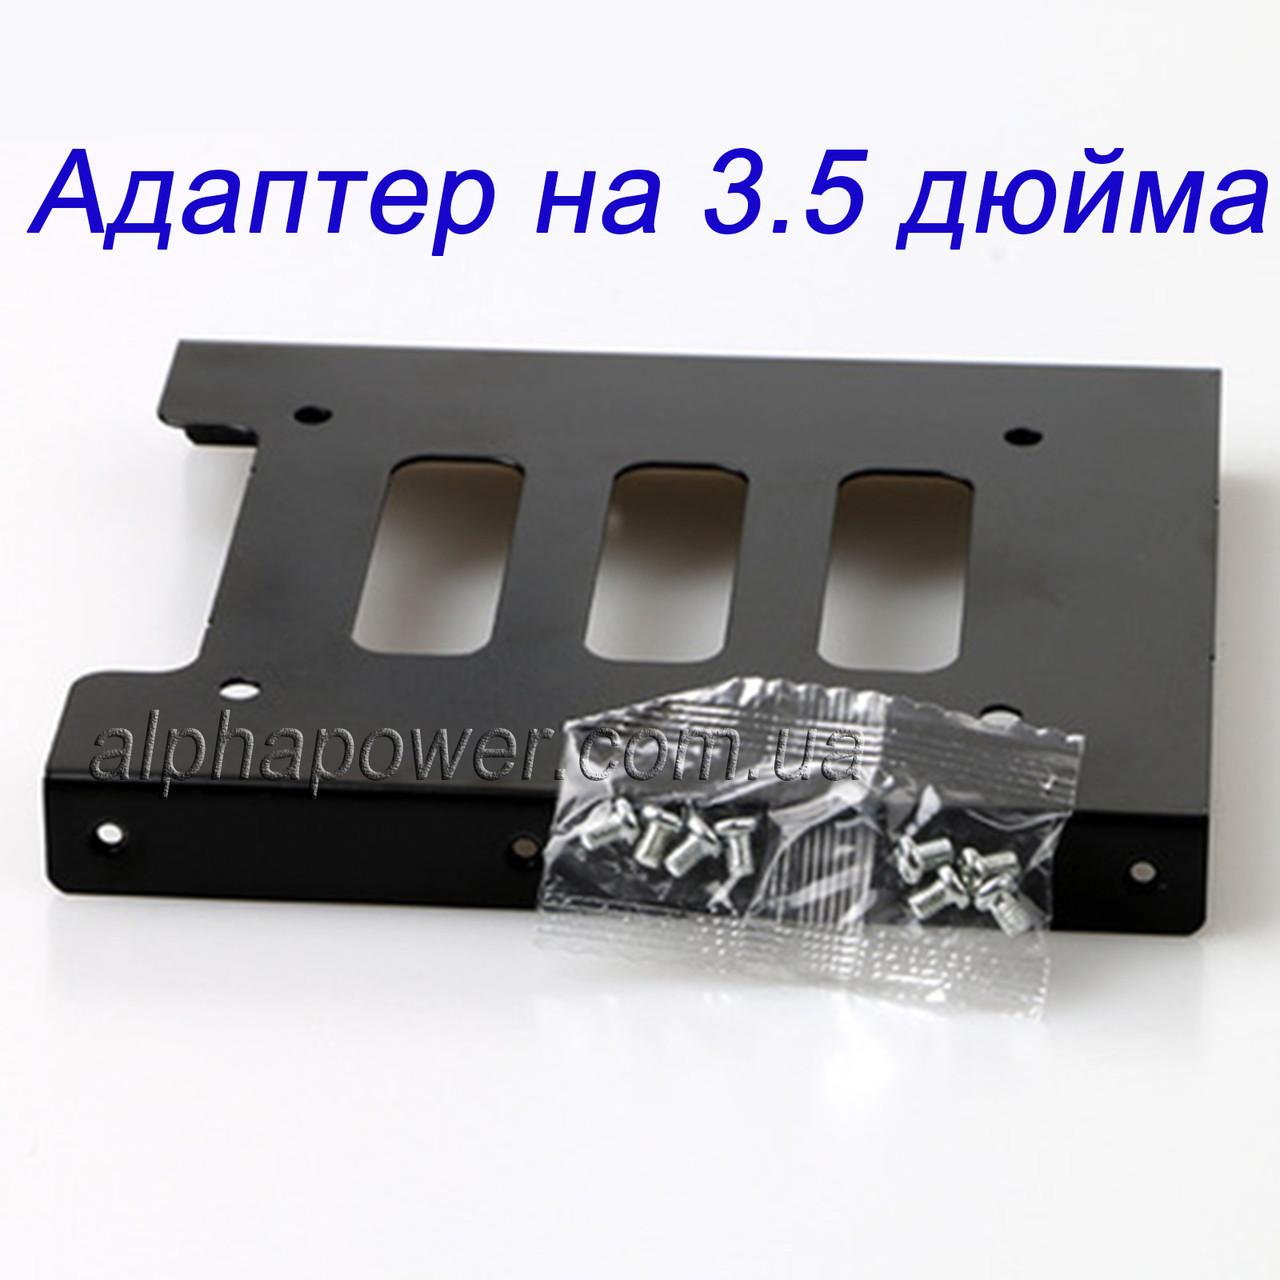 Адаптер для SSD, переходник с 2.5 на 3.5 дюйма для ПК (Металлический)